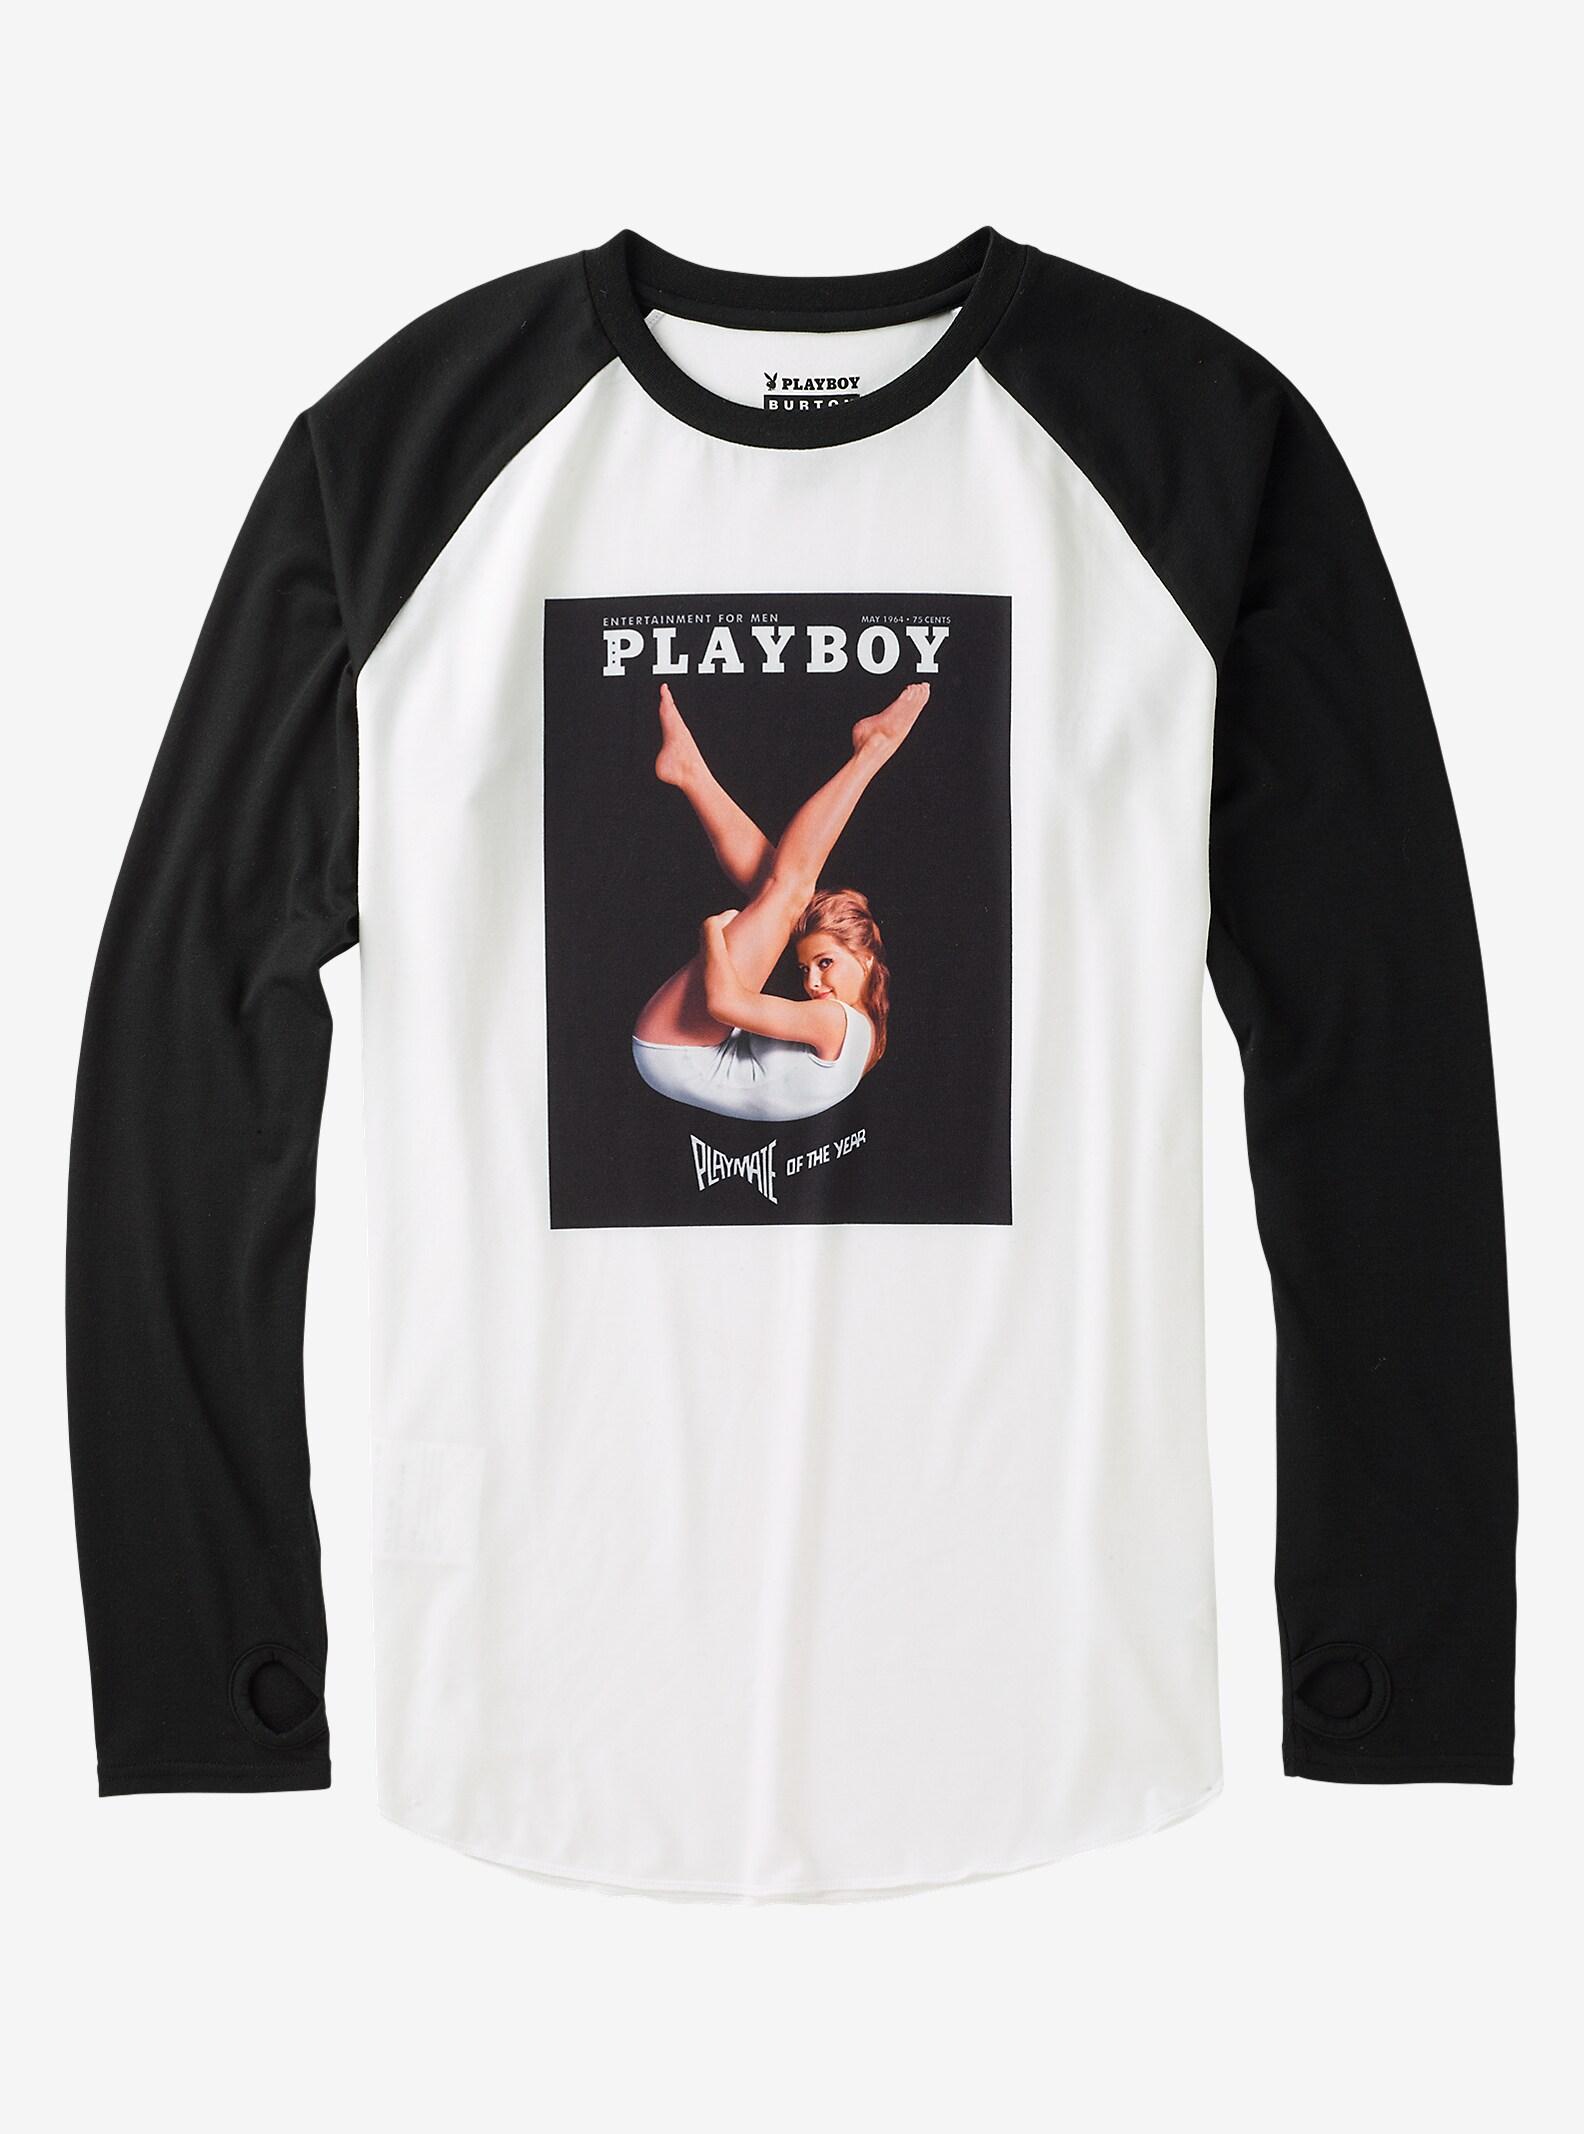 Burton x Playboy Roadie Tech Tee shown in Playboy 1964